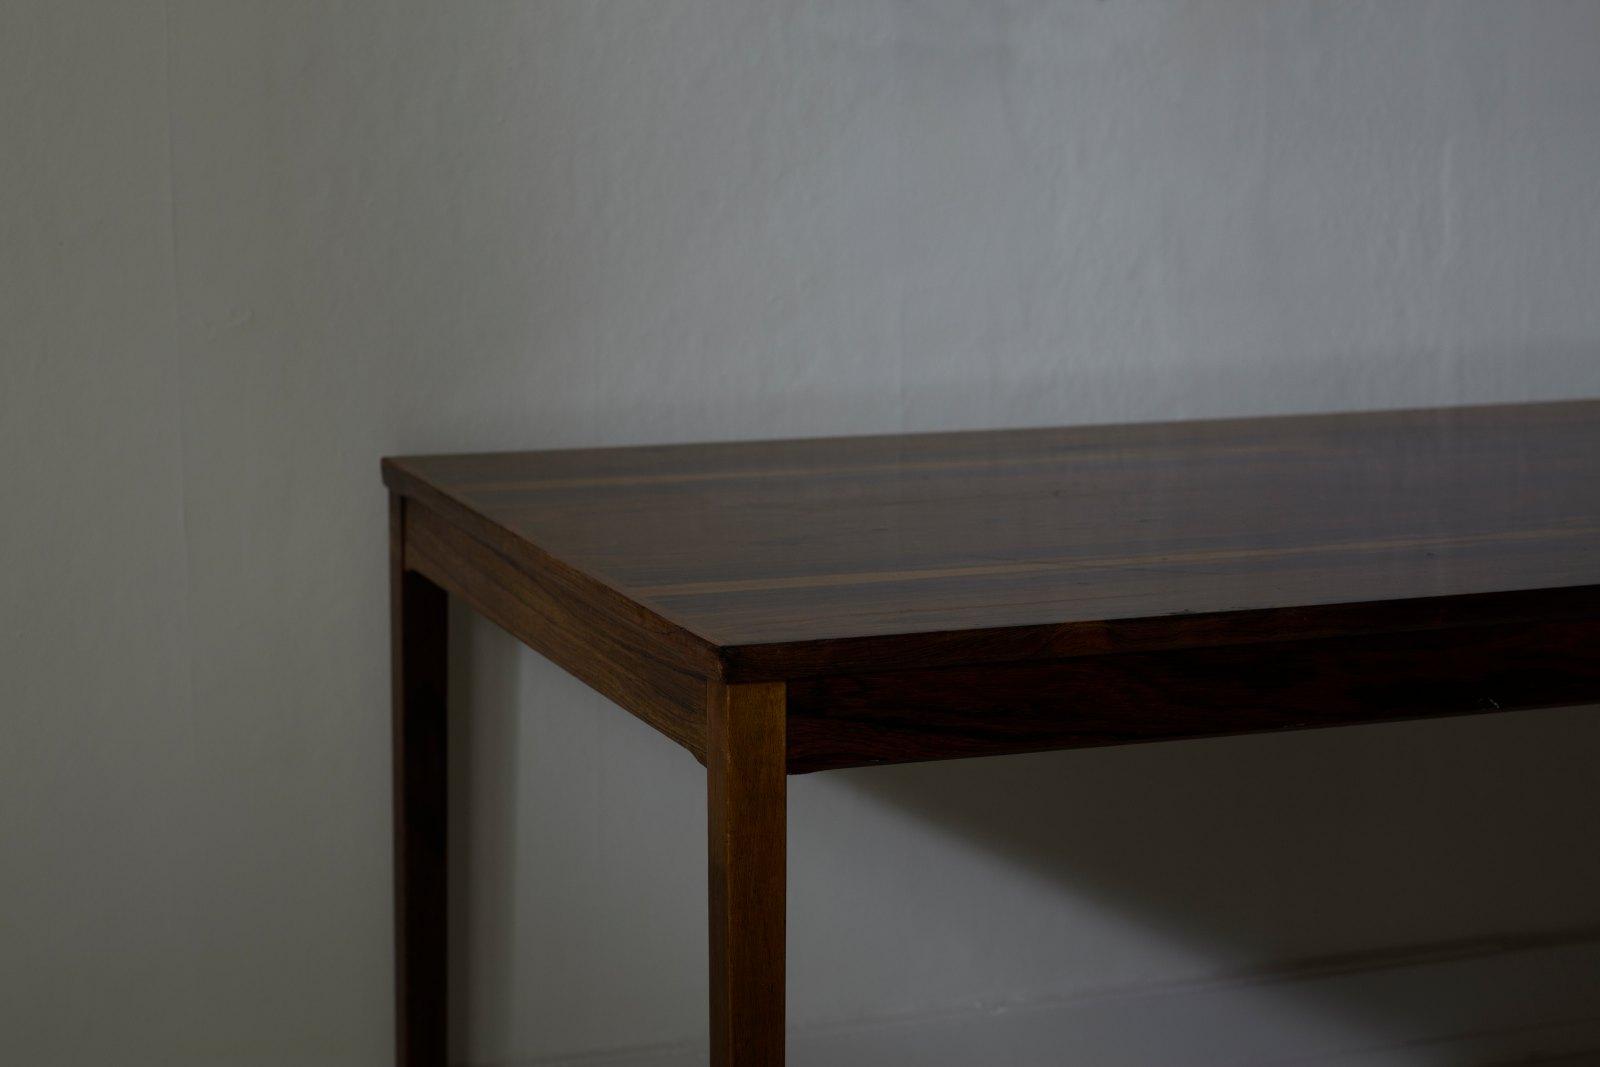 Corner, 2010, C-print, 77 x 111 cm